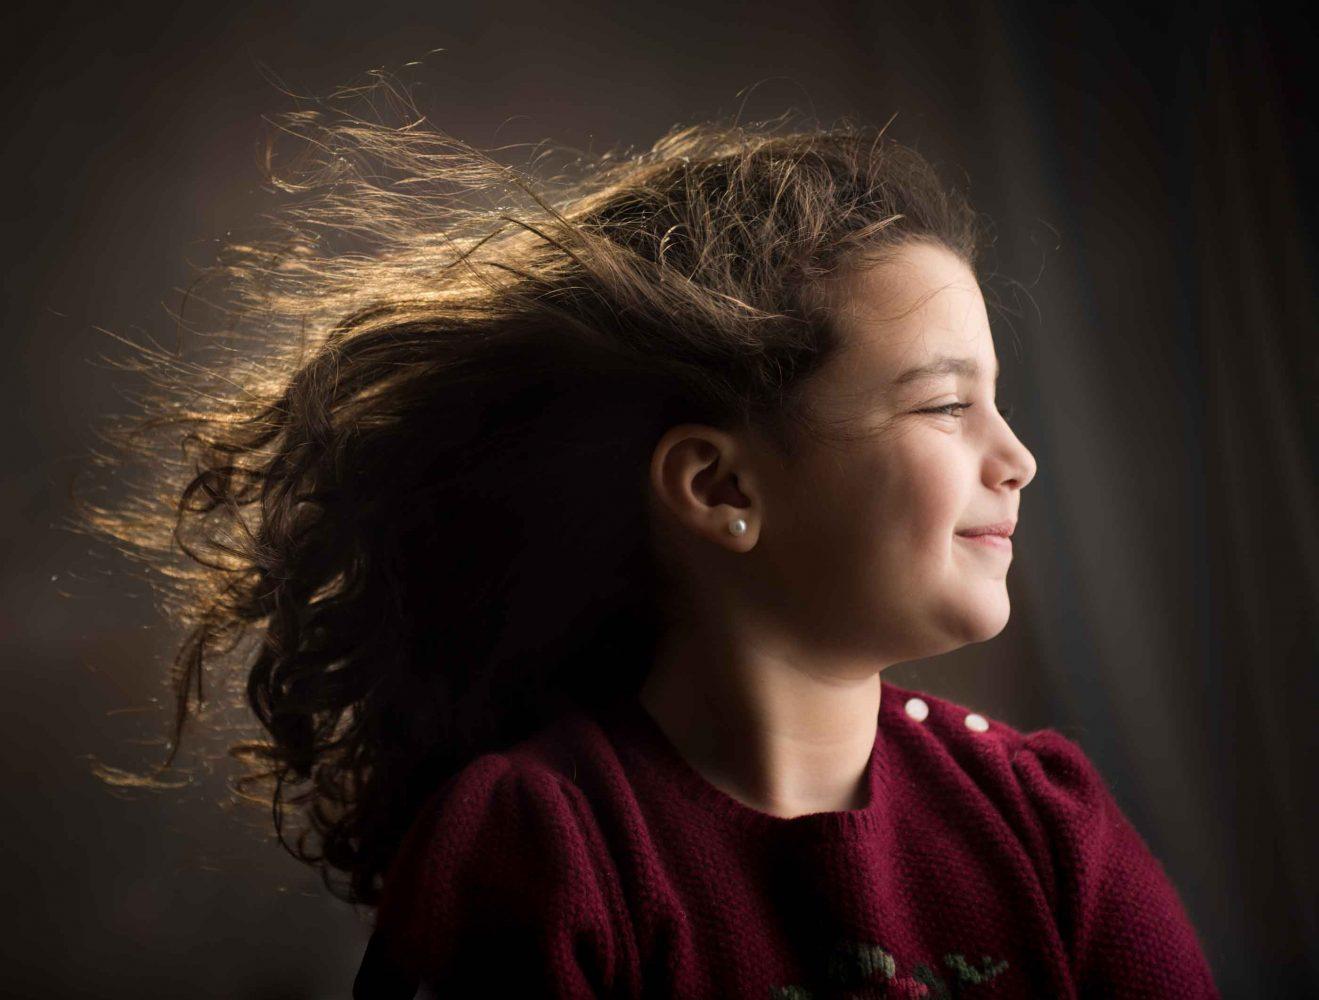 portrait of a girl with windblown hair in studio by Ruchy Oberlander in Boro Park, Kensington, Brooklyn, NY